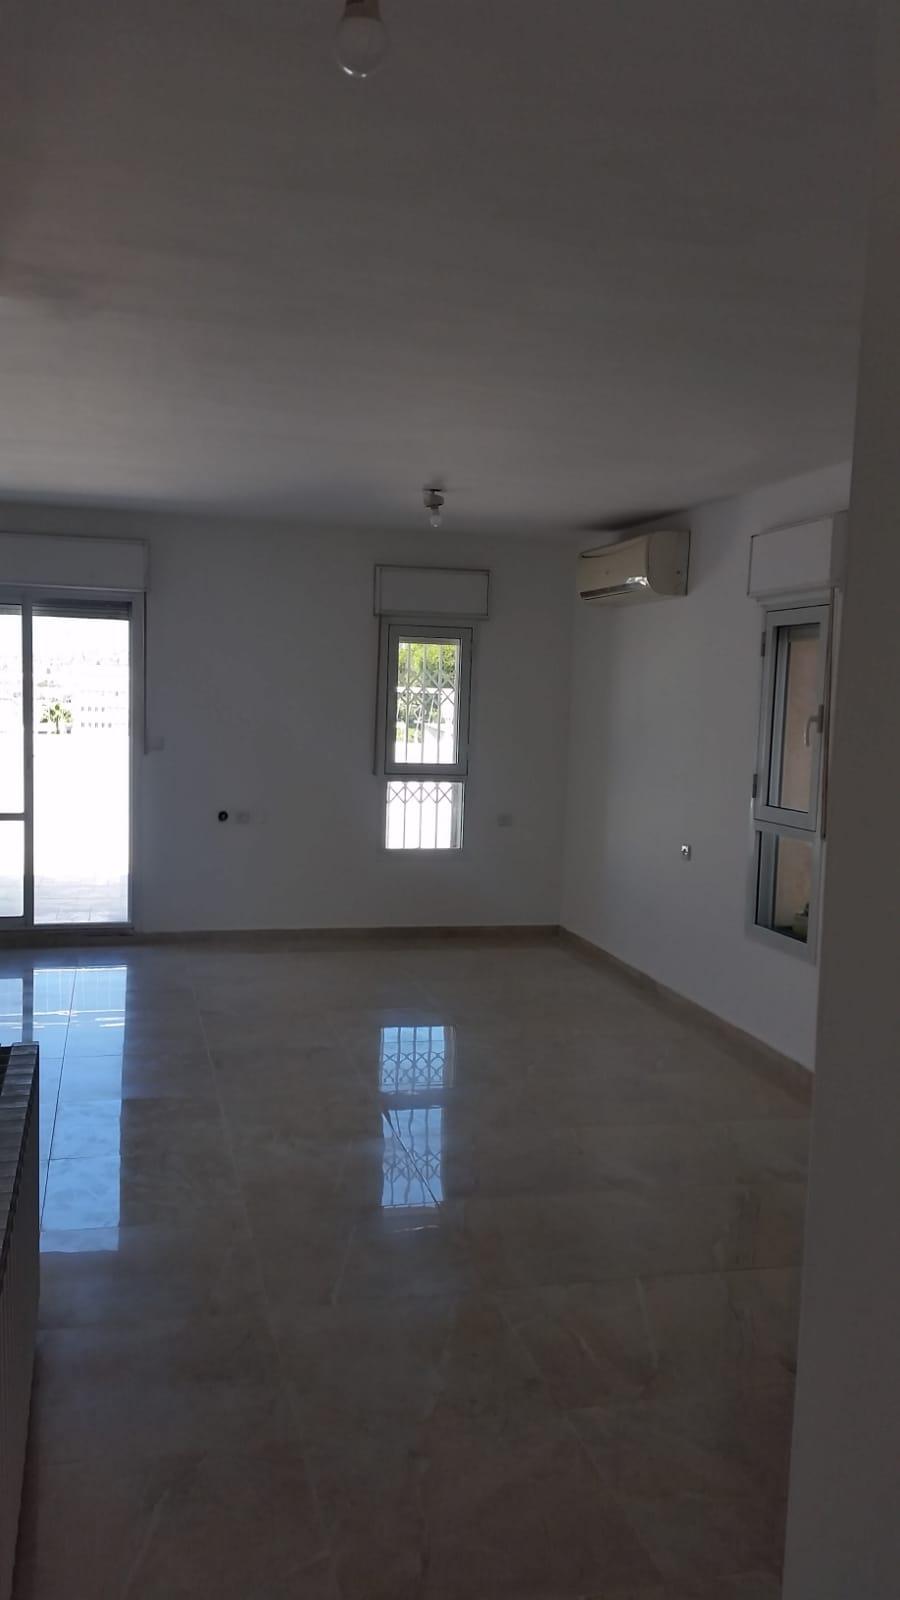 Apartment 105m2 – 4 rooms - Talpiot, Jerusalem, 5mn walking from Baka